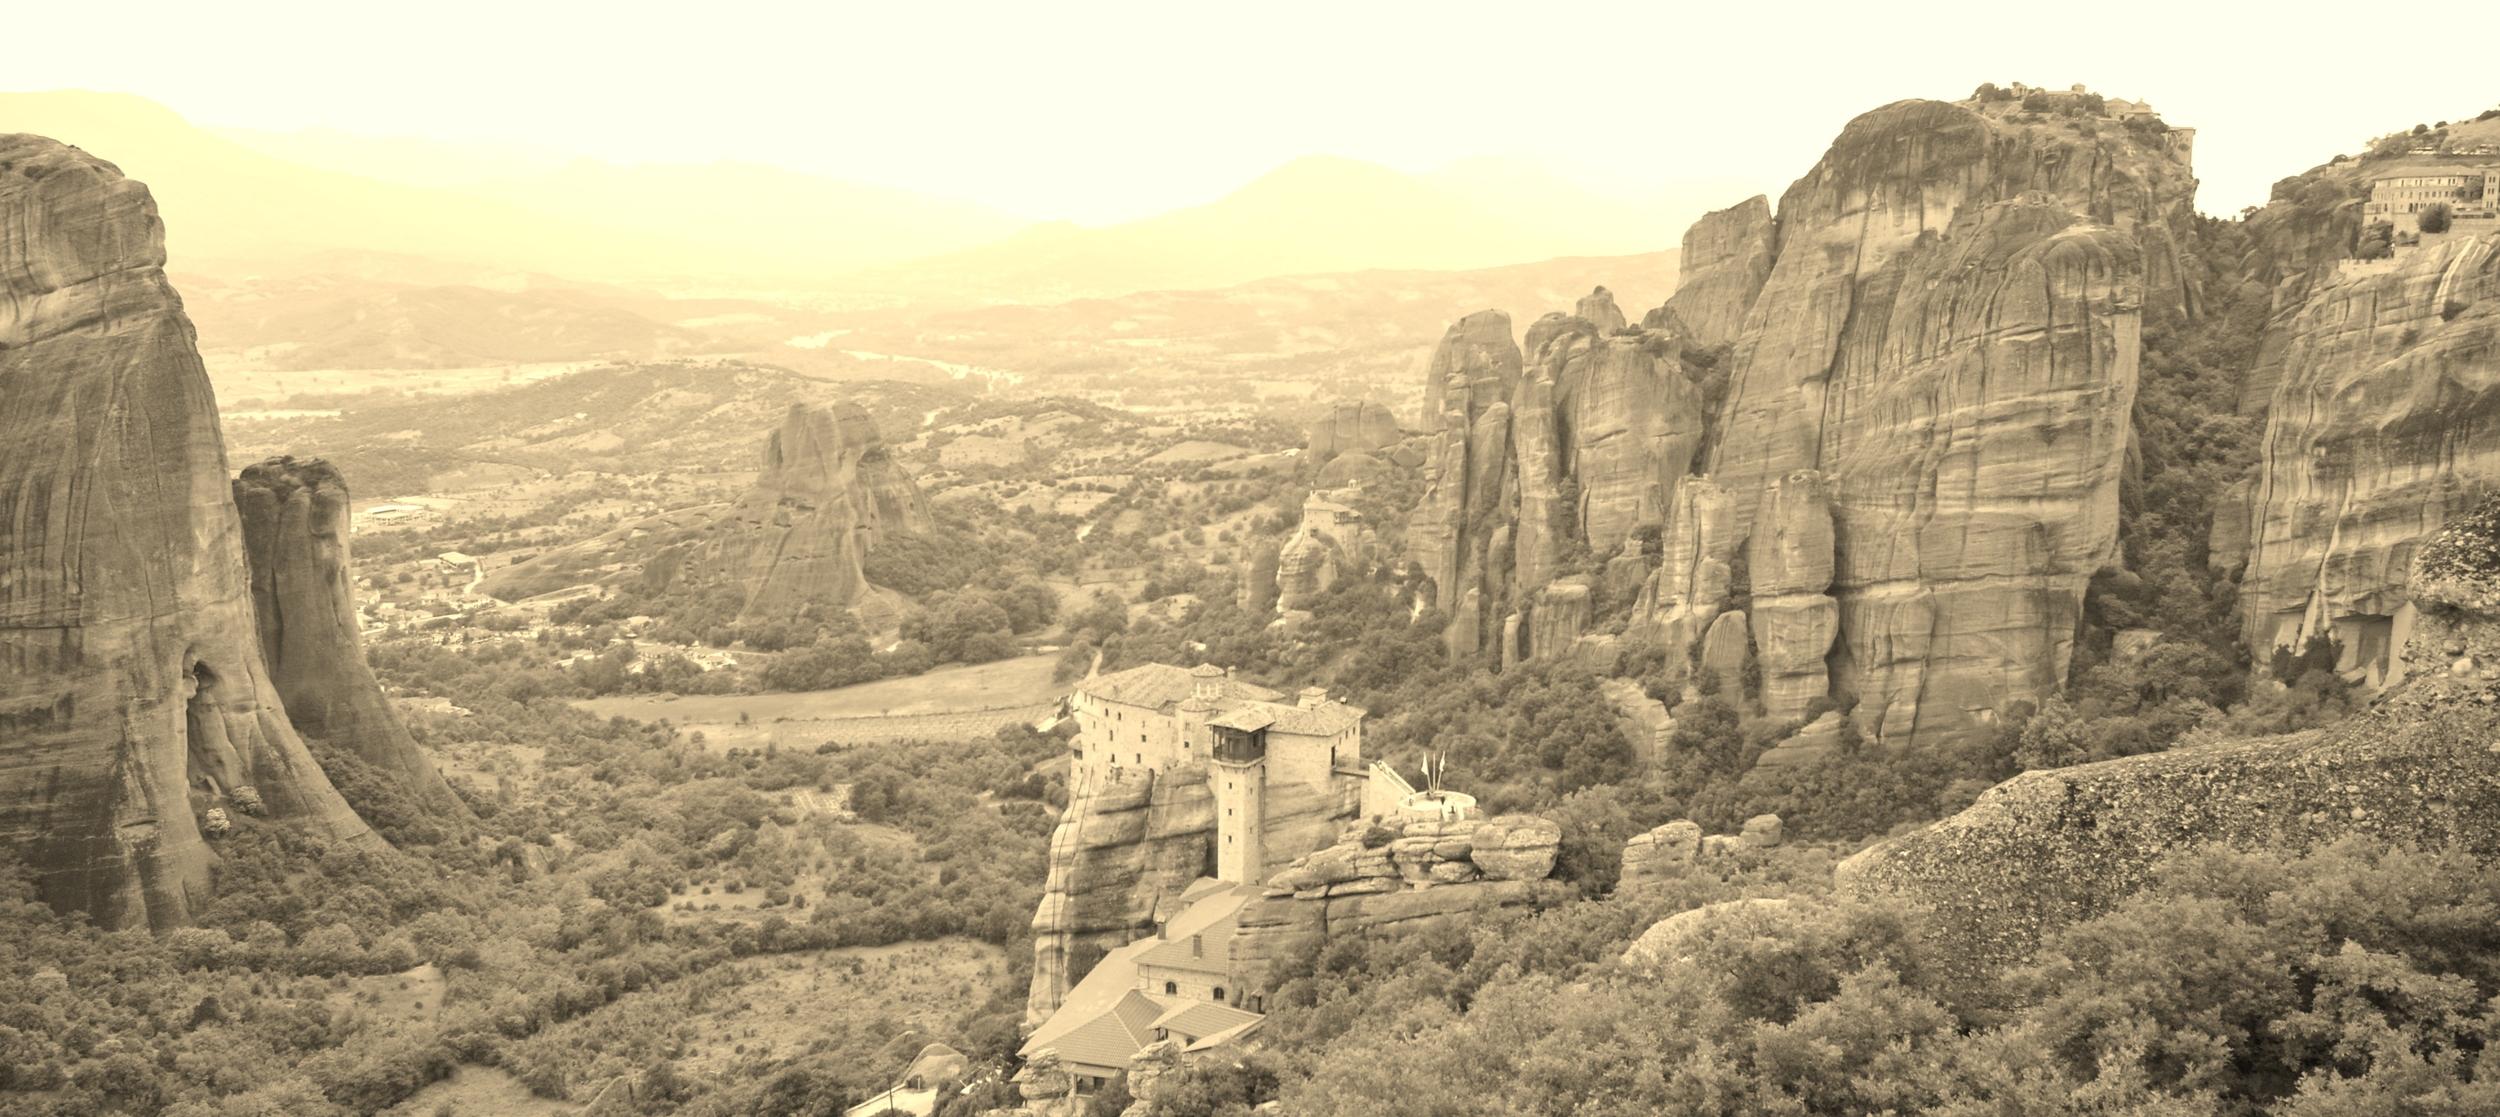 Meteora, Greece, 2009